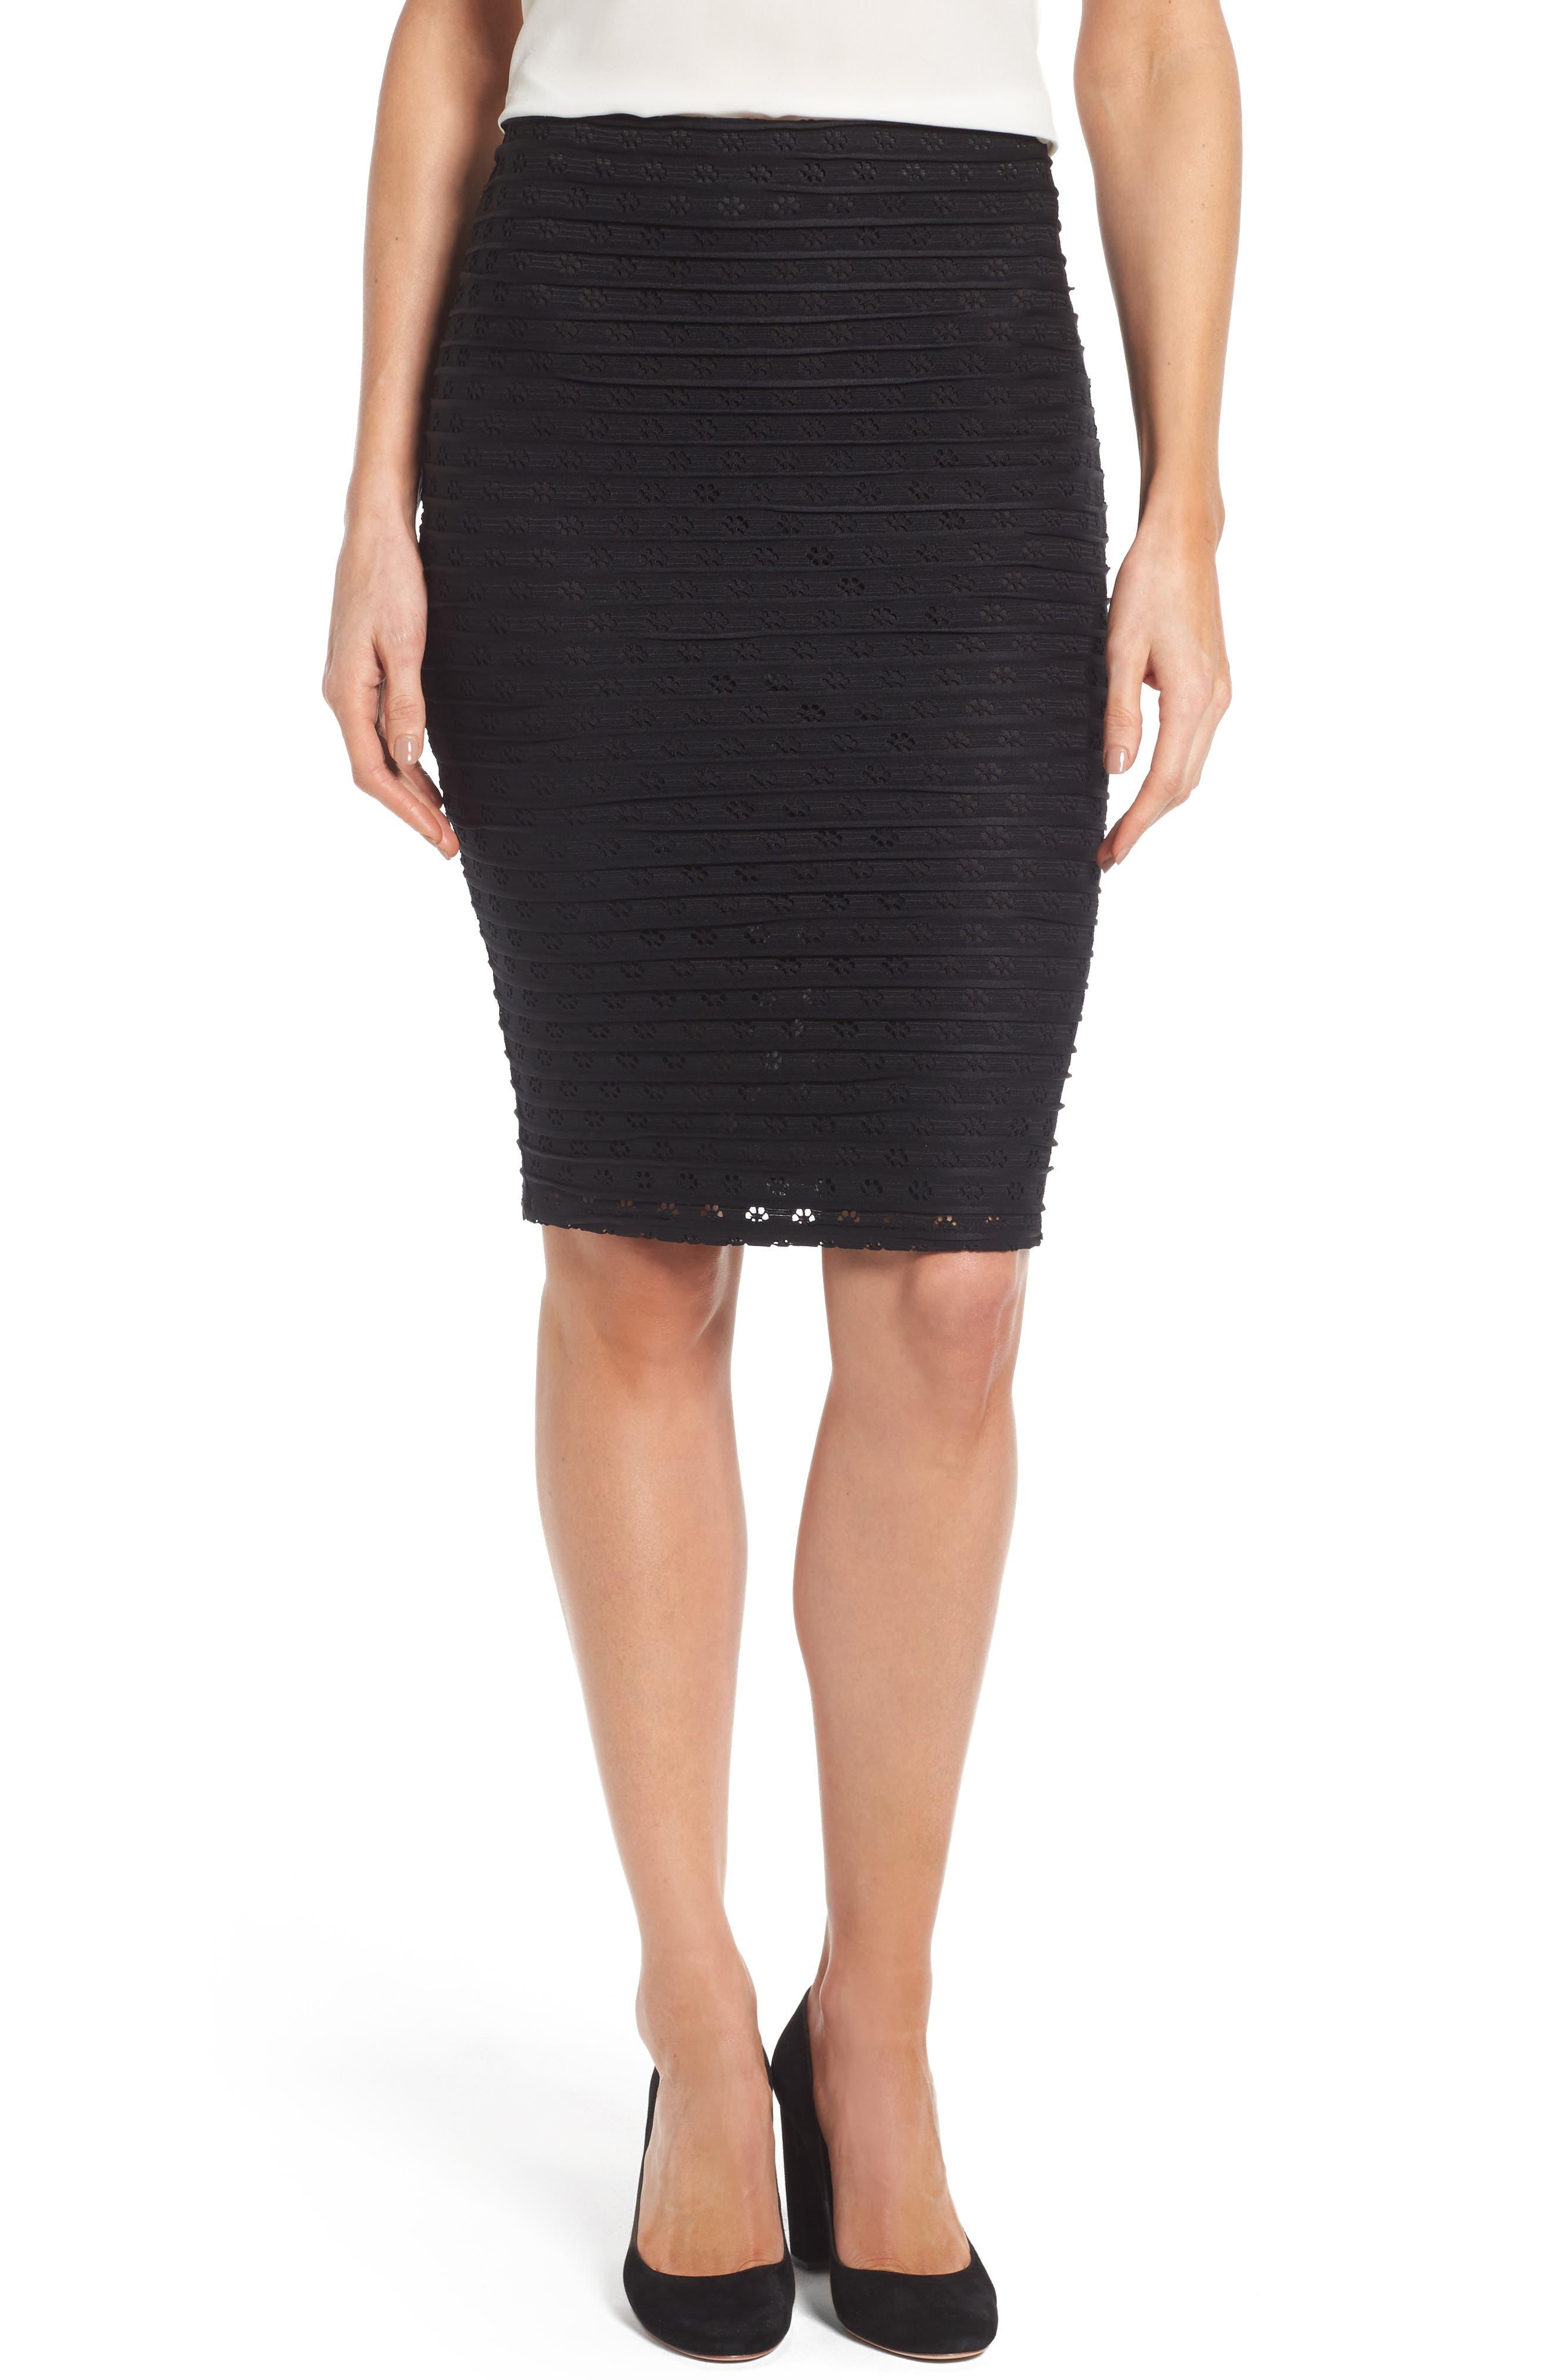 CeCe Jacquard Knit Pencil Skirt